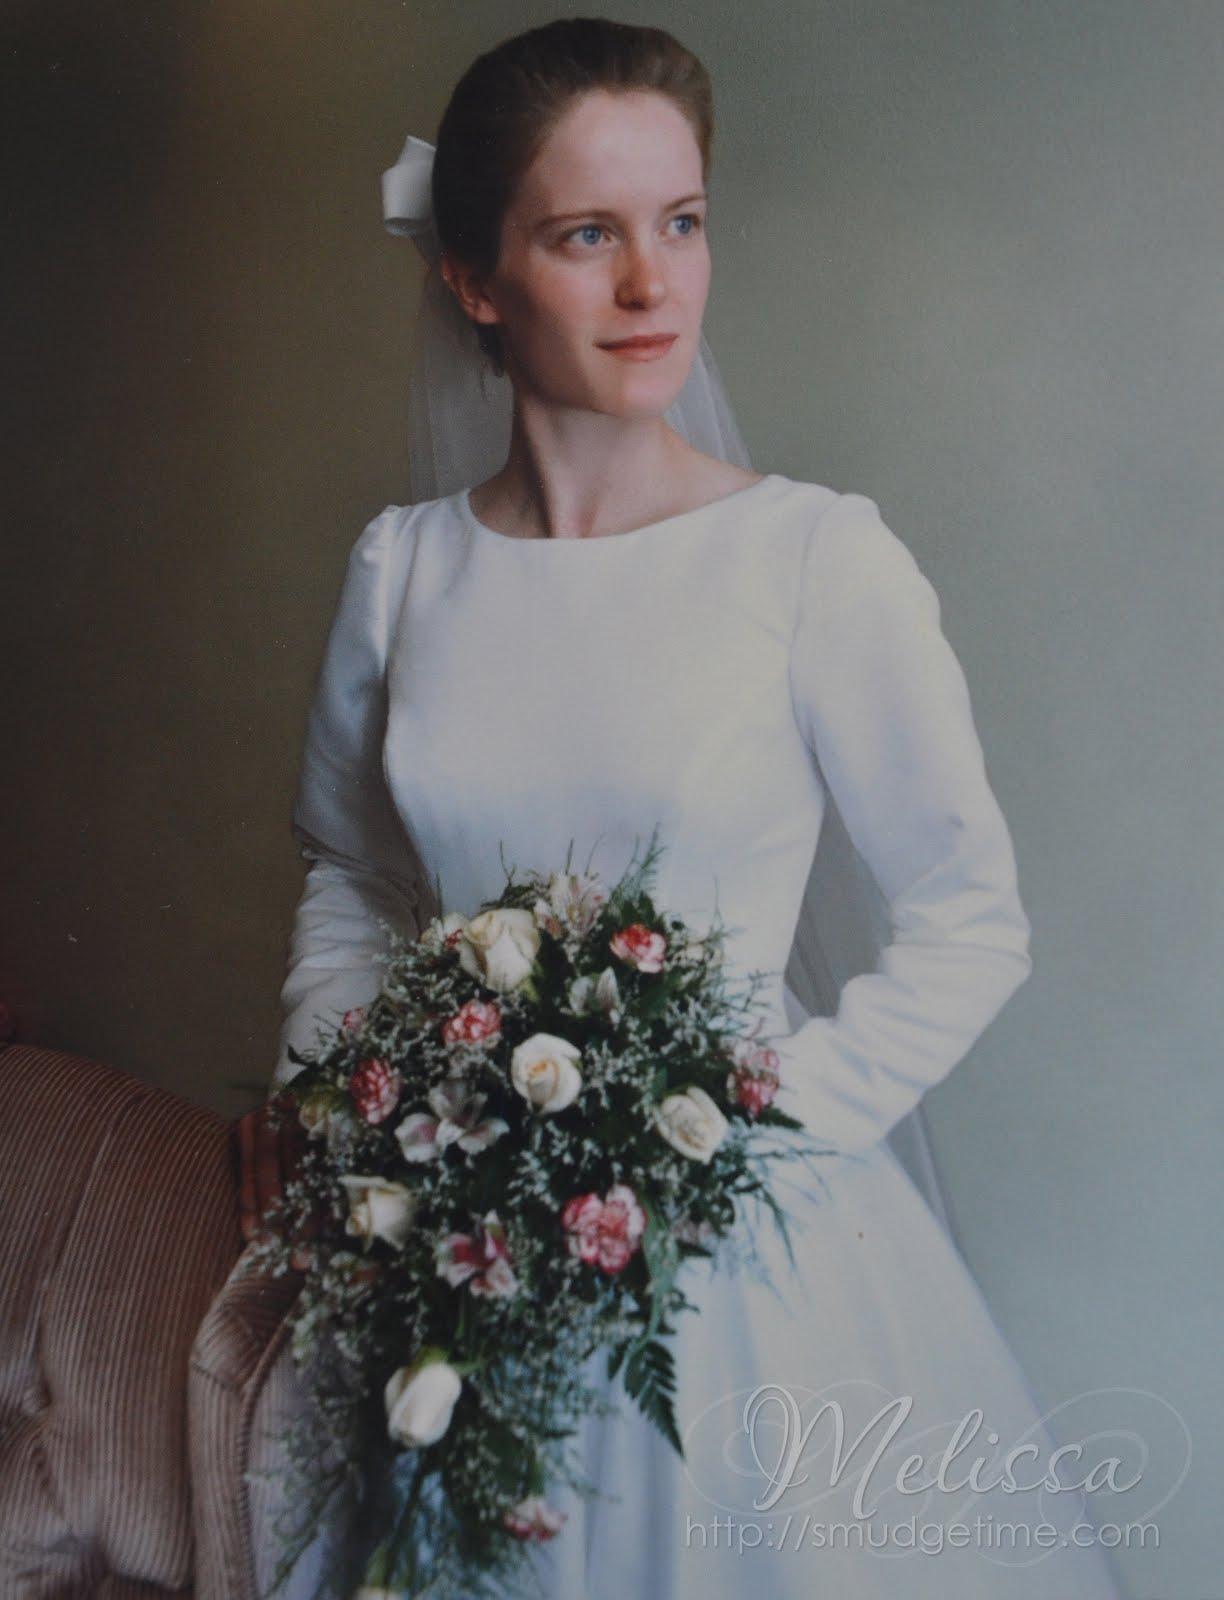 Darnell and deidre wedding dress